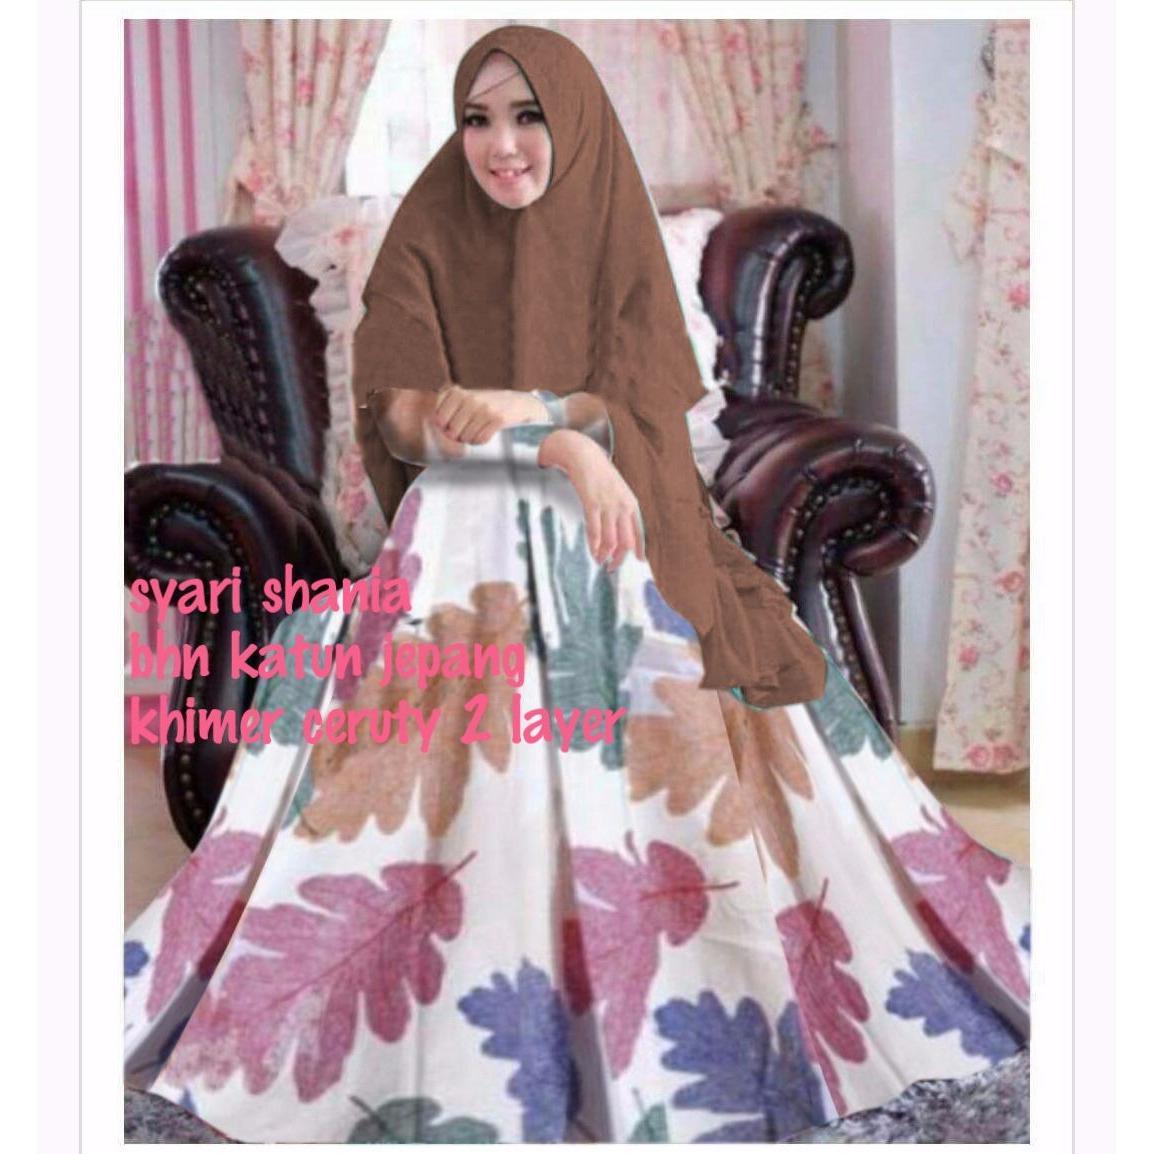 Gsd Fashion Baju Muslim Wanita Set Levi Salem Update Daftar Harga Kekinian Dress Sauqina M Sw Rayon Maroon